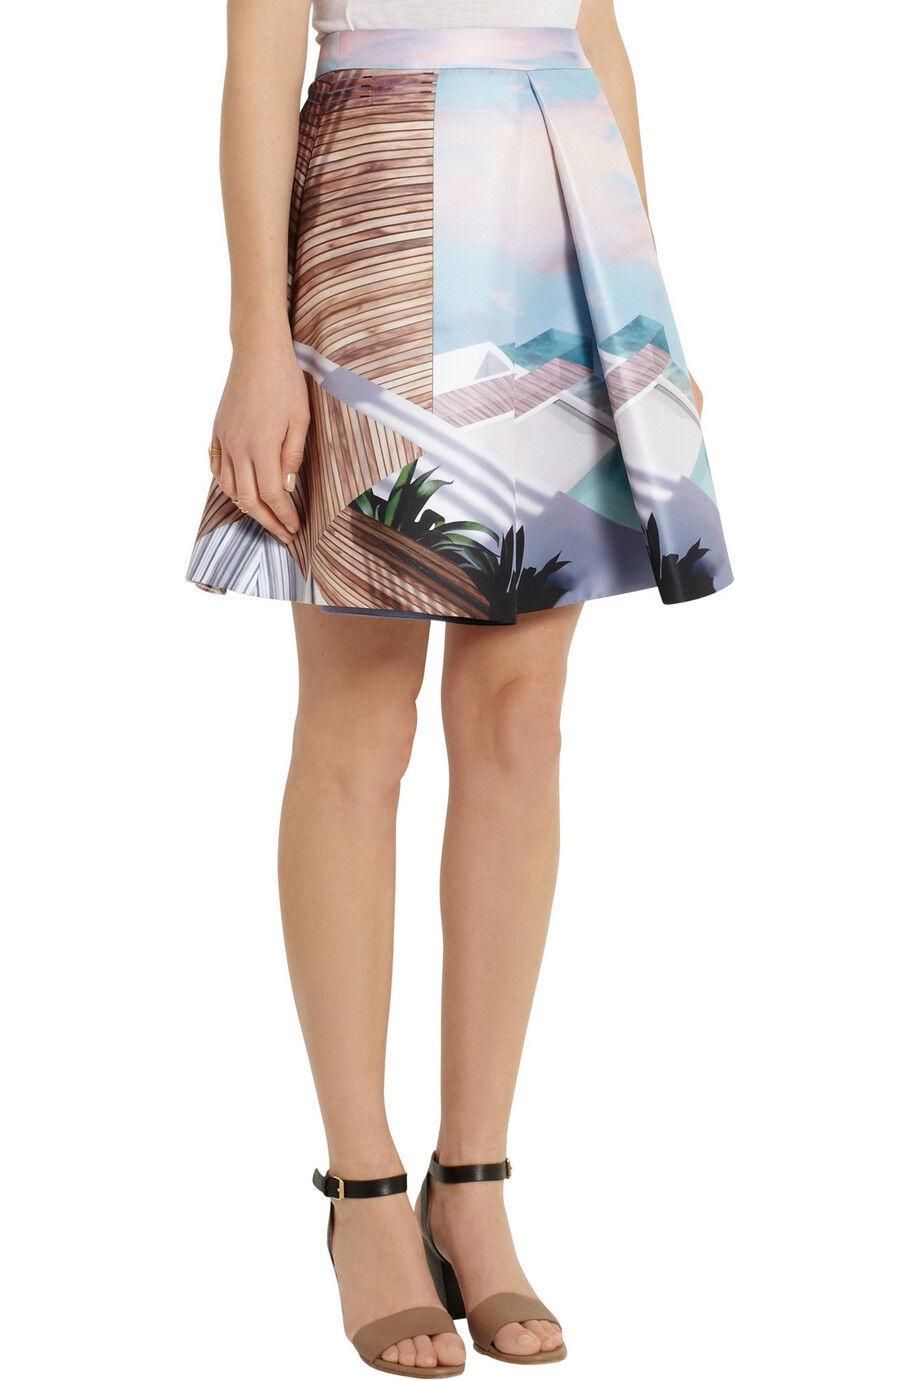 Nuevo  Mary Katrantzou Katmandú Impreso Plisada Falda Con Bolsillos-  comprar mejor